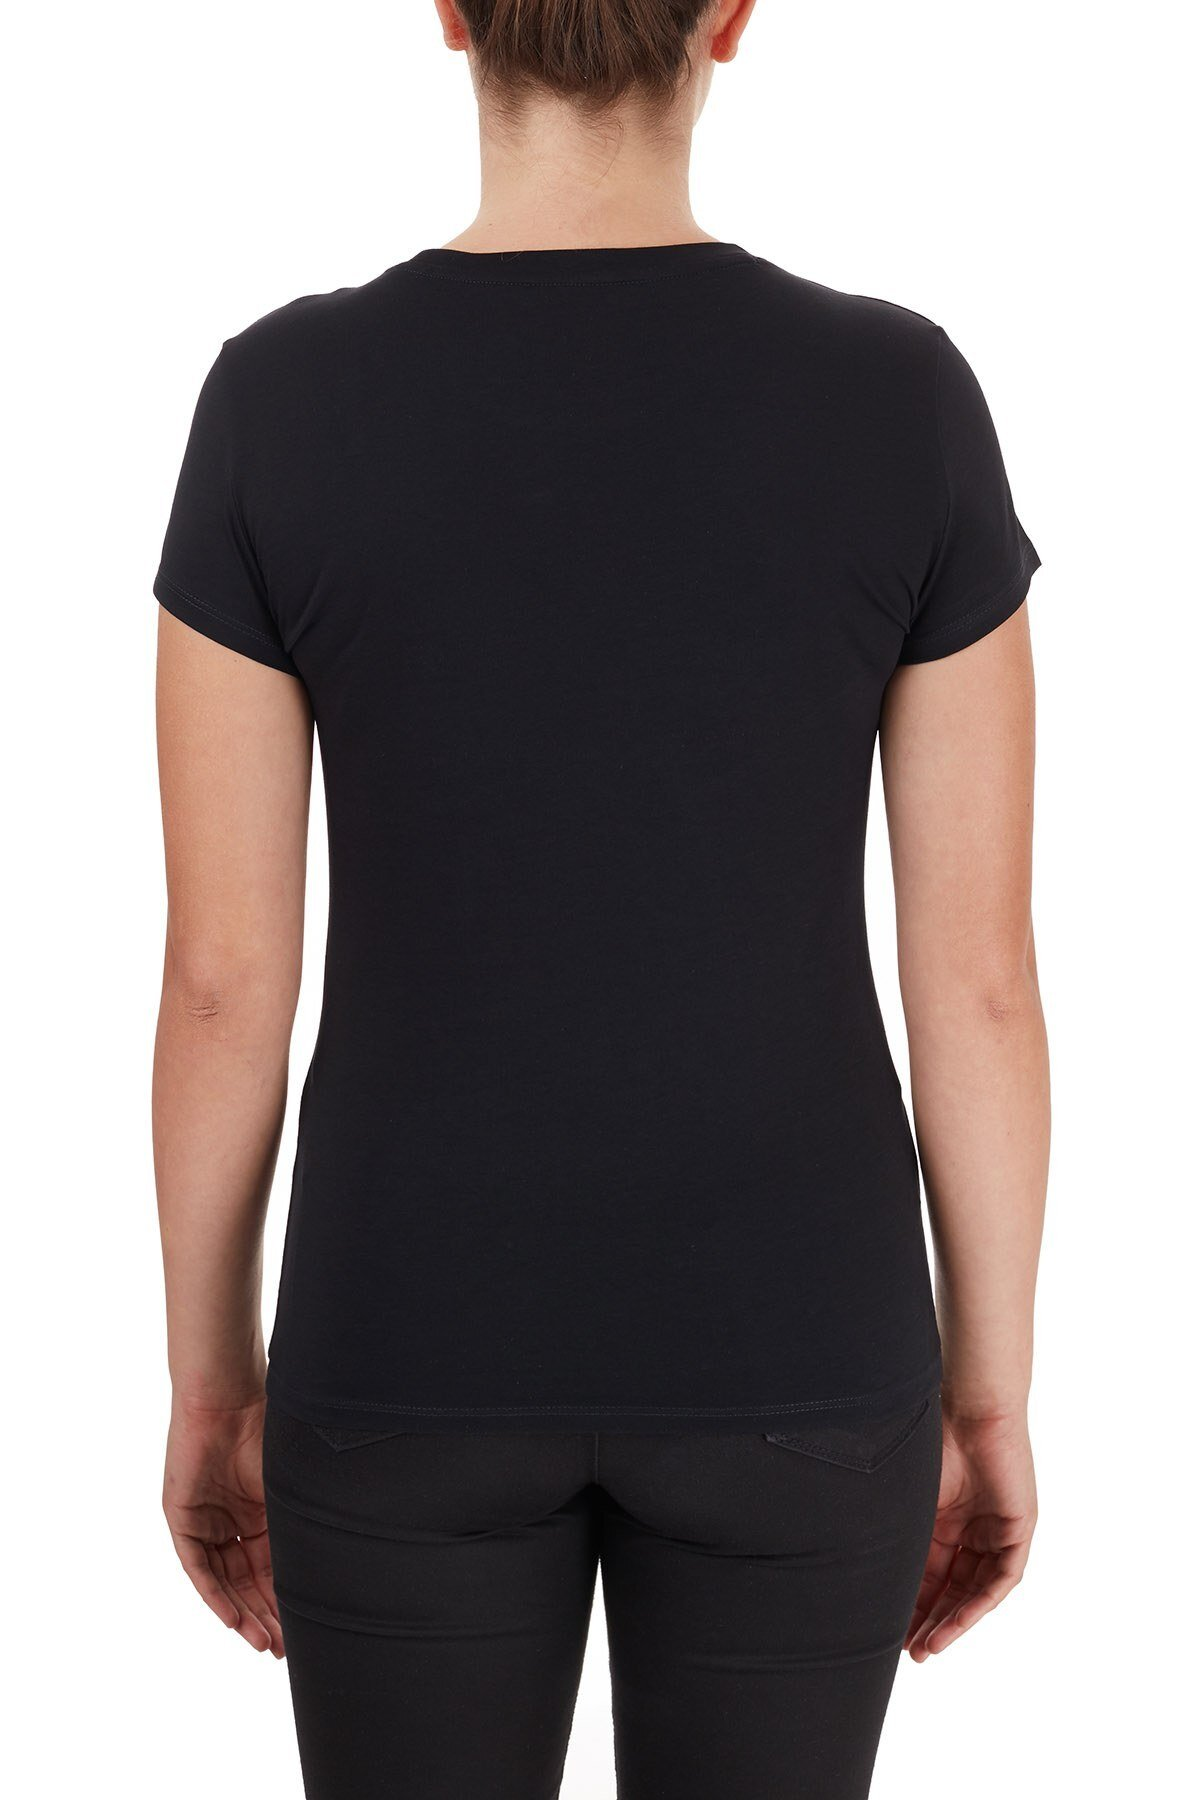 Armani Exchange % 100 Pamuklu Logo Baskılı Bisiklet Yaka Bayan T Shirt 6HYTFA YJ16Z 1200 SİYAH